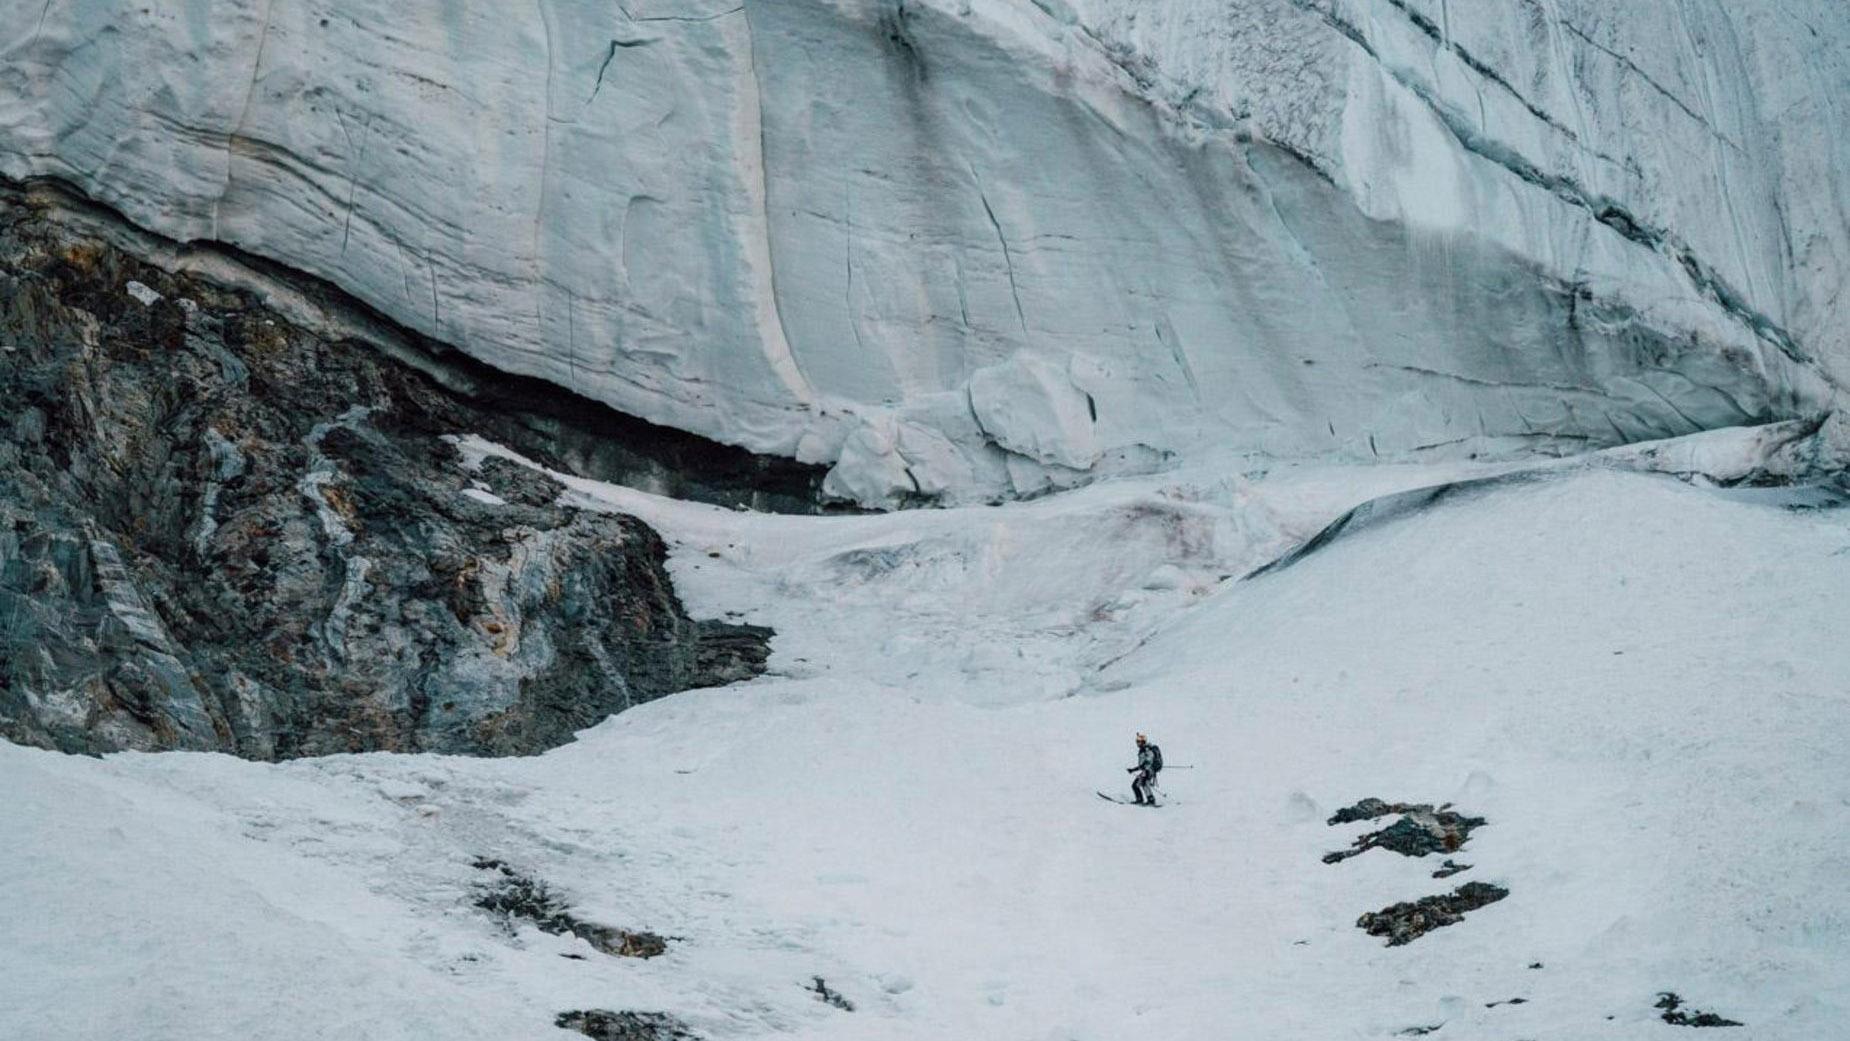 Andrzej Bargiel skis down K2 mountain (video)